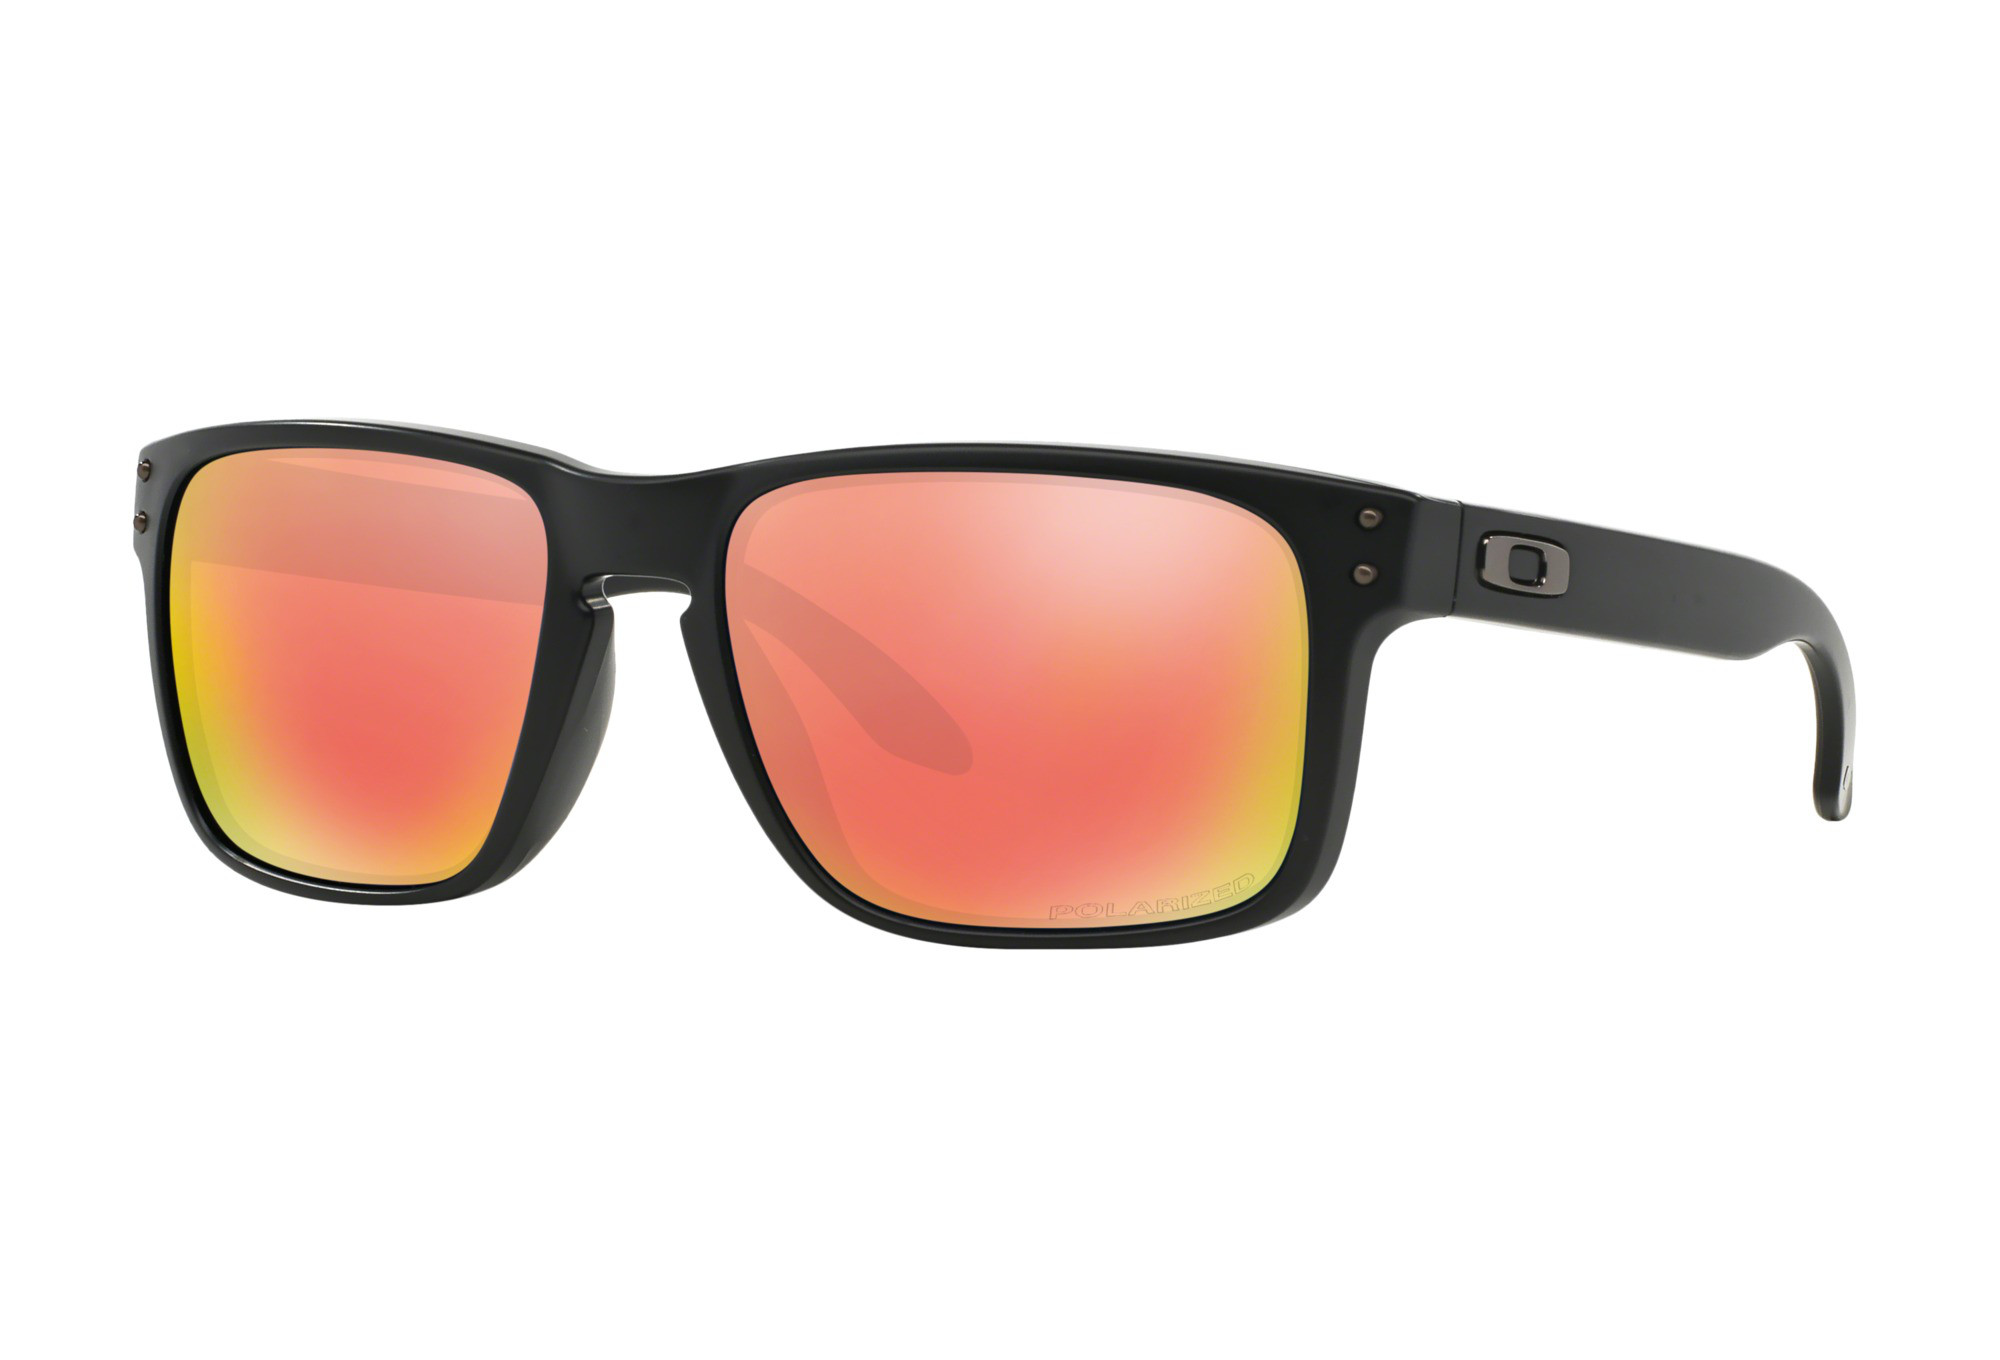 4c3fe5472abaa OAKLEY Sunglasses HOLBROOK Matte Black   Ruby Iridium Polarized Ref OO9102- 51